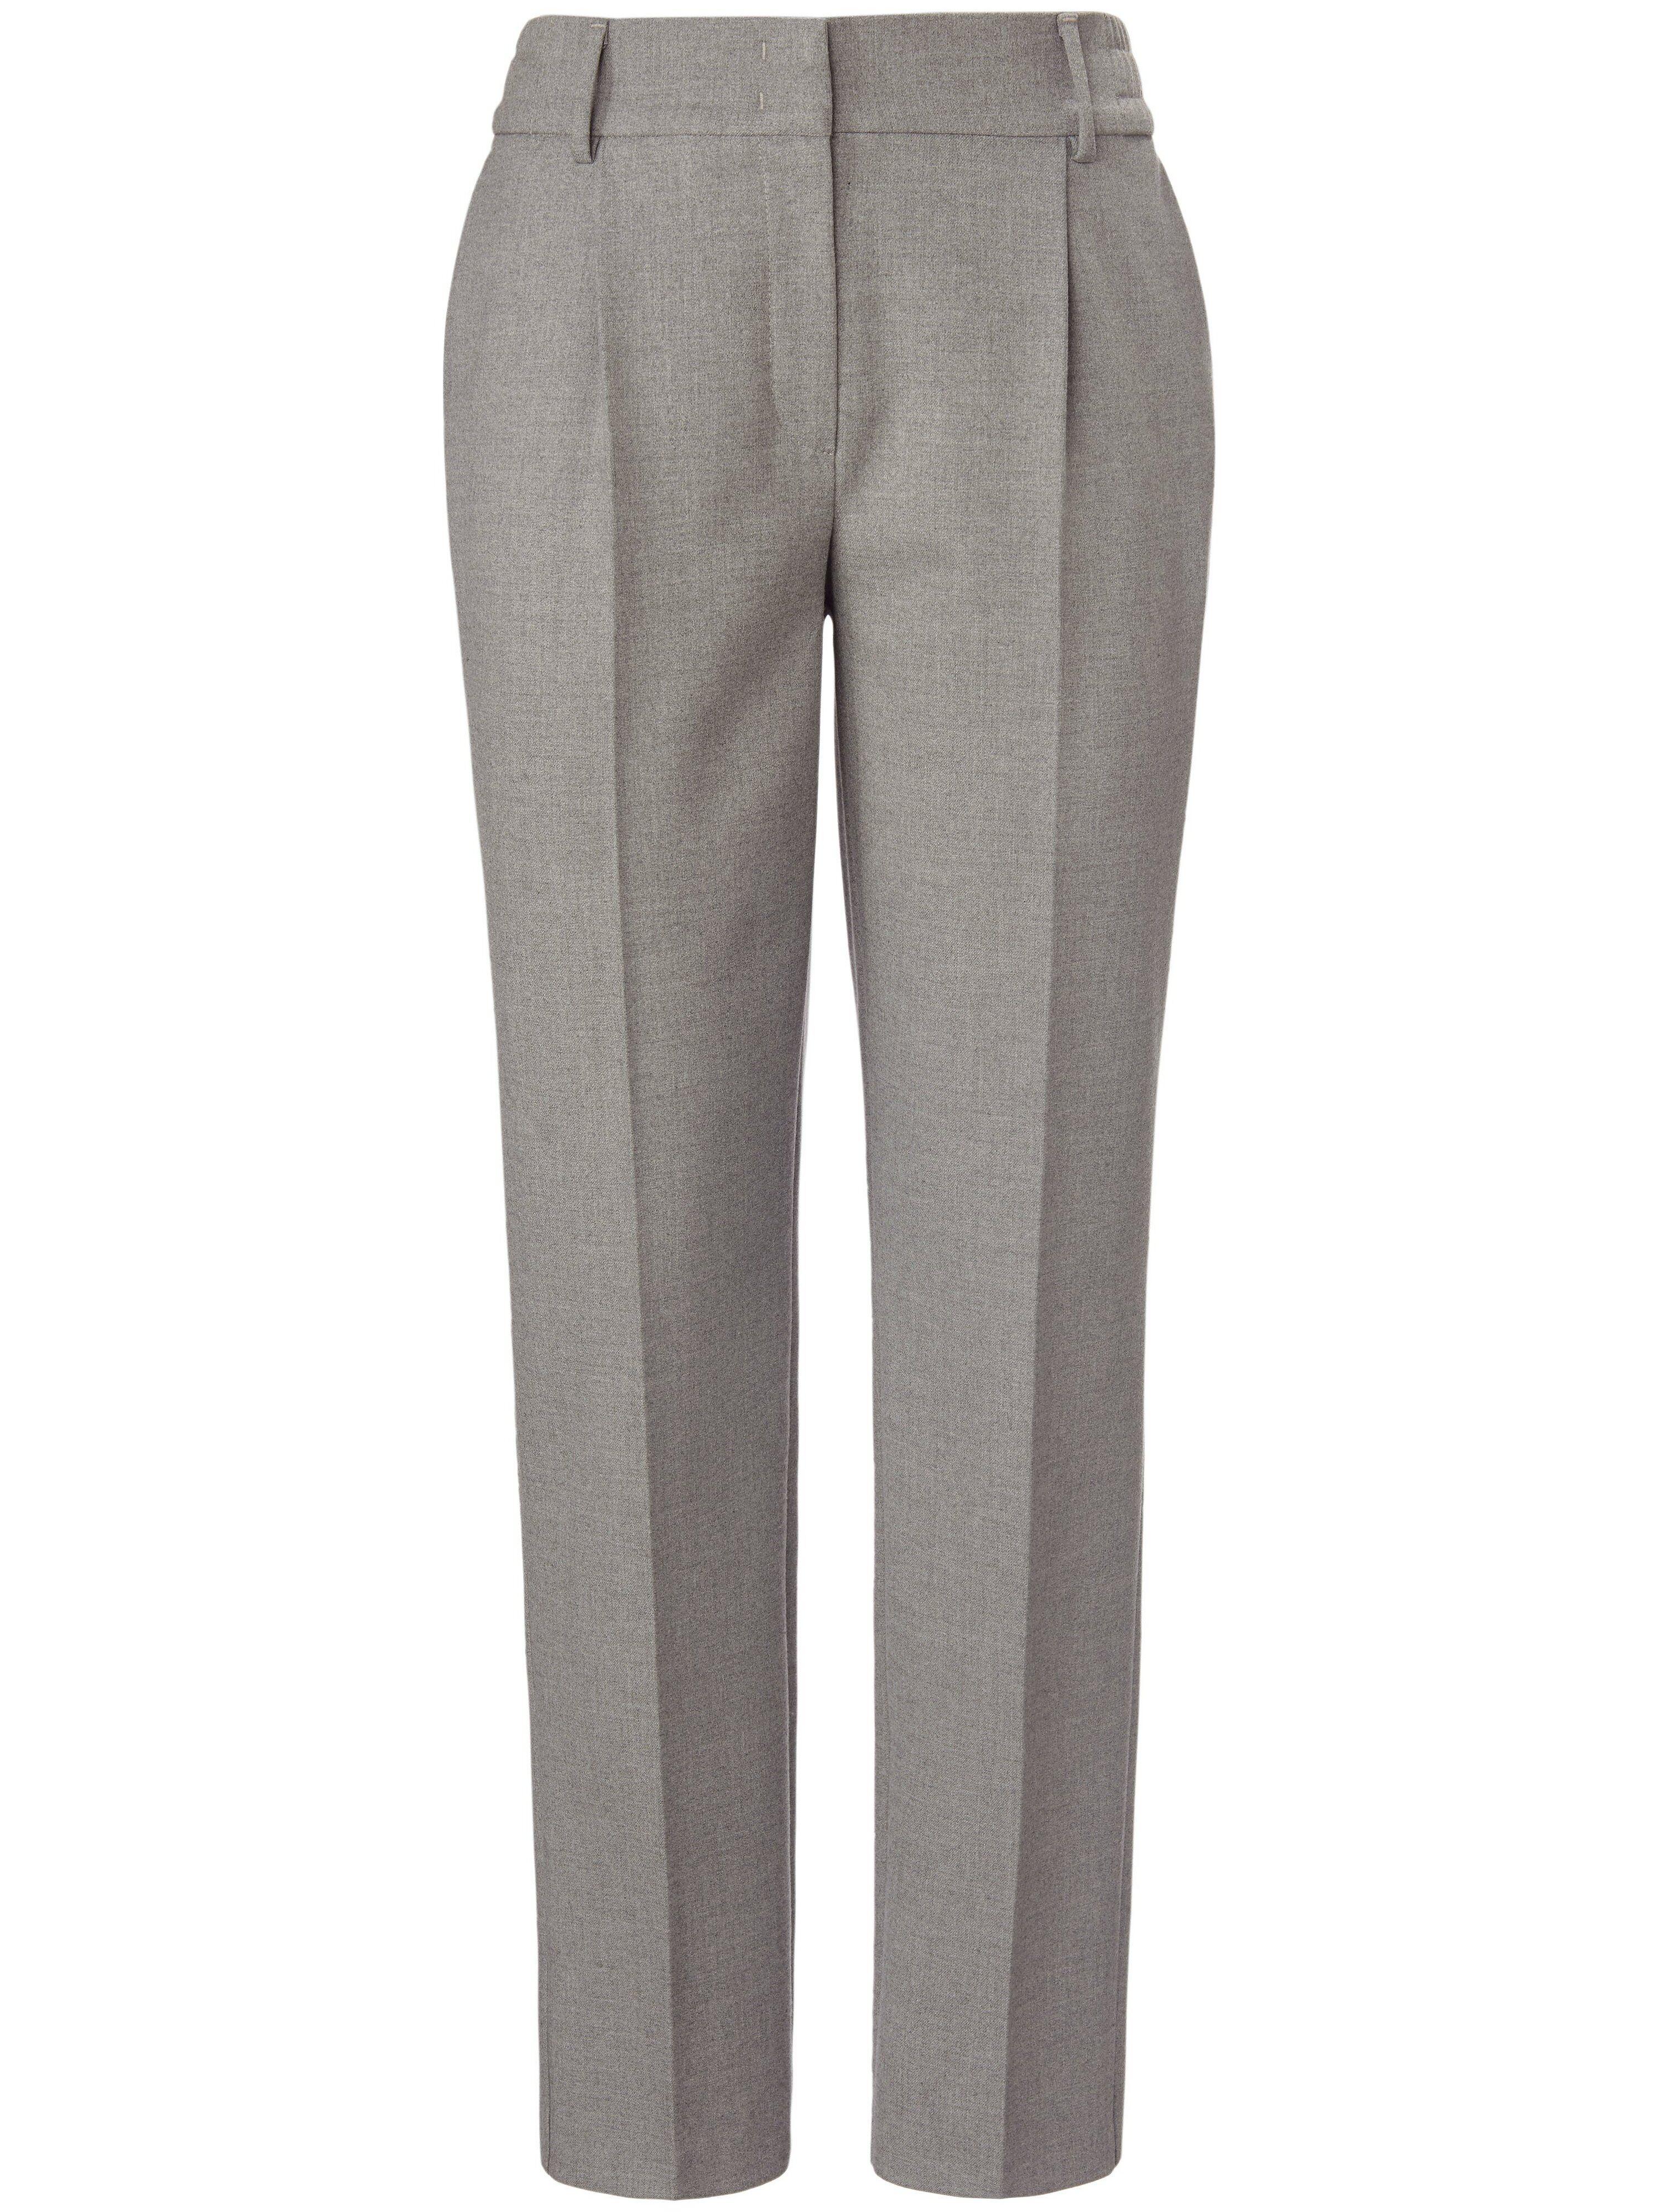 TALBOT RUNHOF X PETER HAHN Le pantalon à pinces  TALBOT RUNHOF X PETER HAHN gris  - Femme - 19